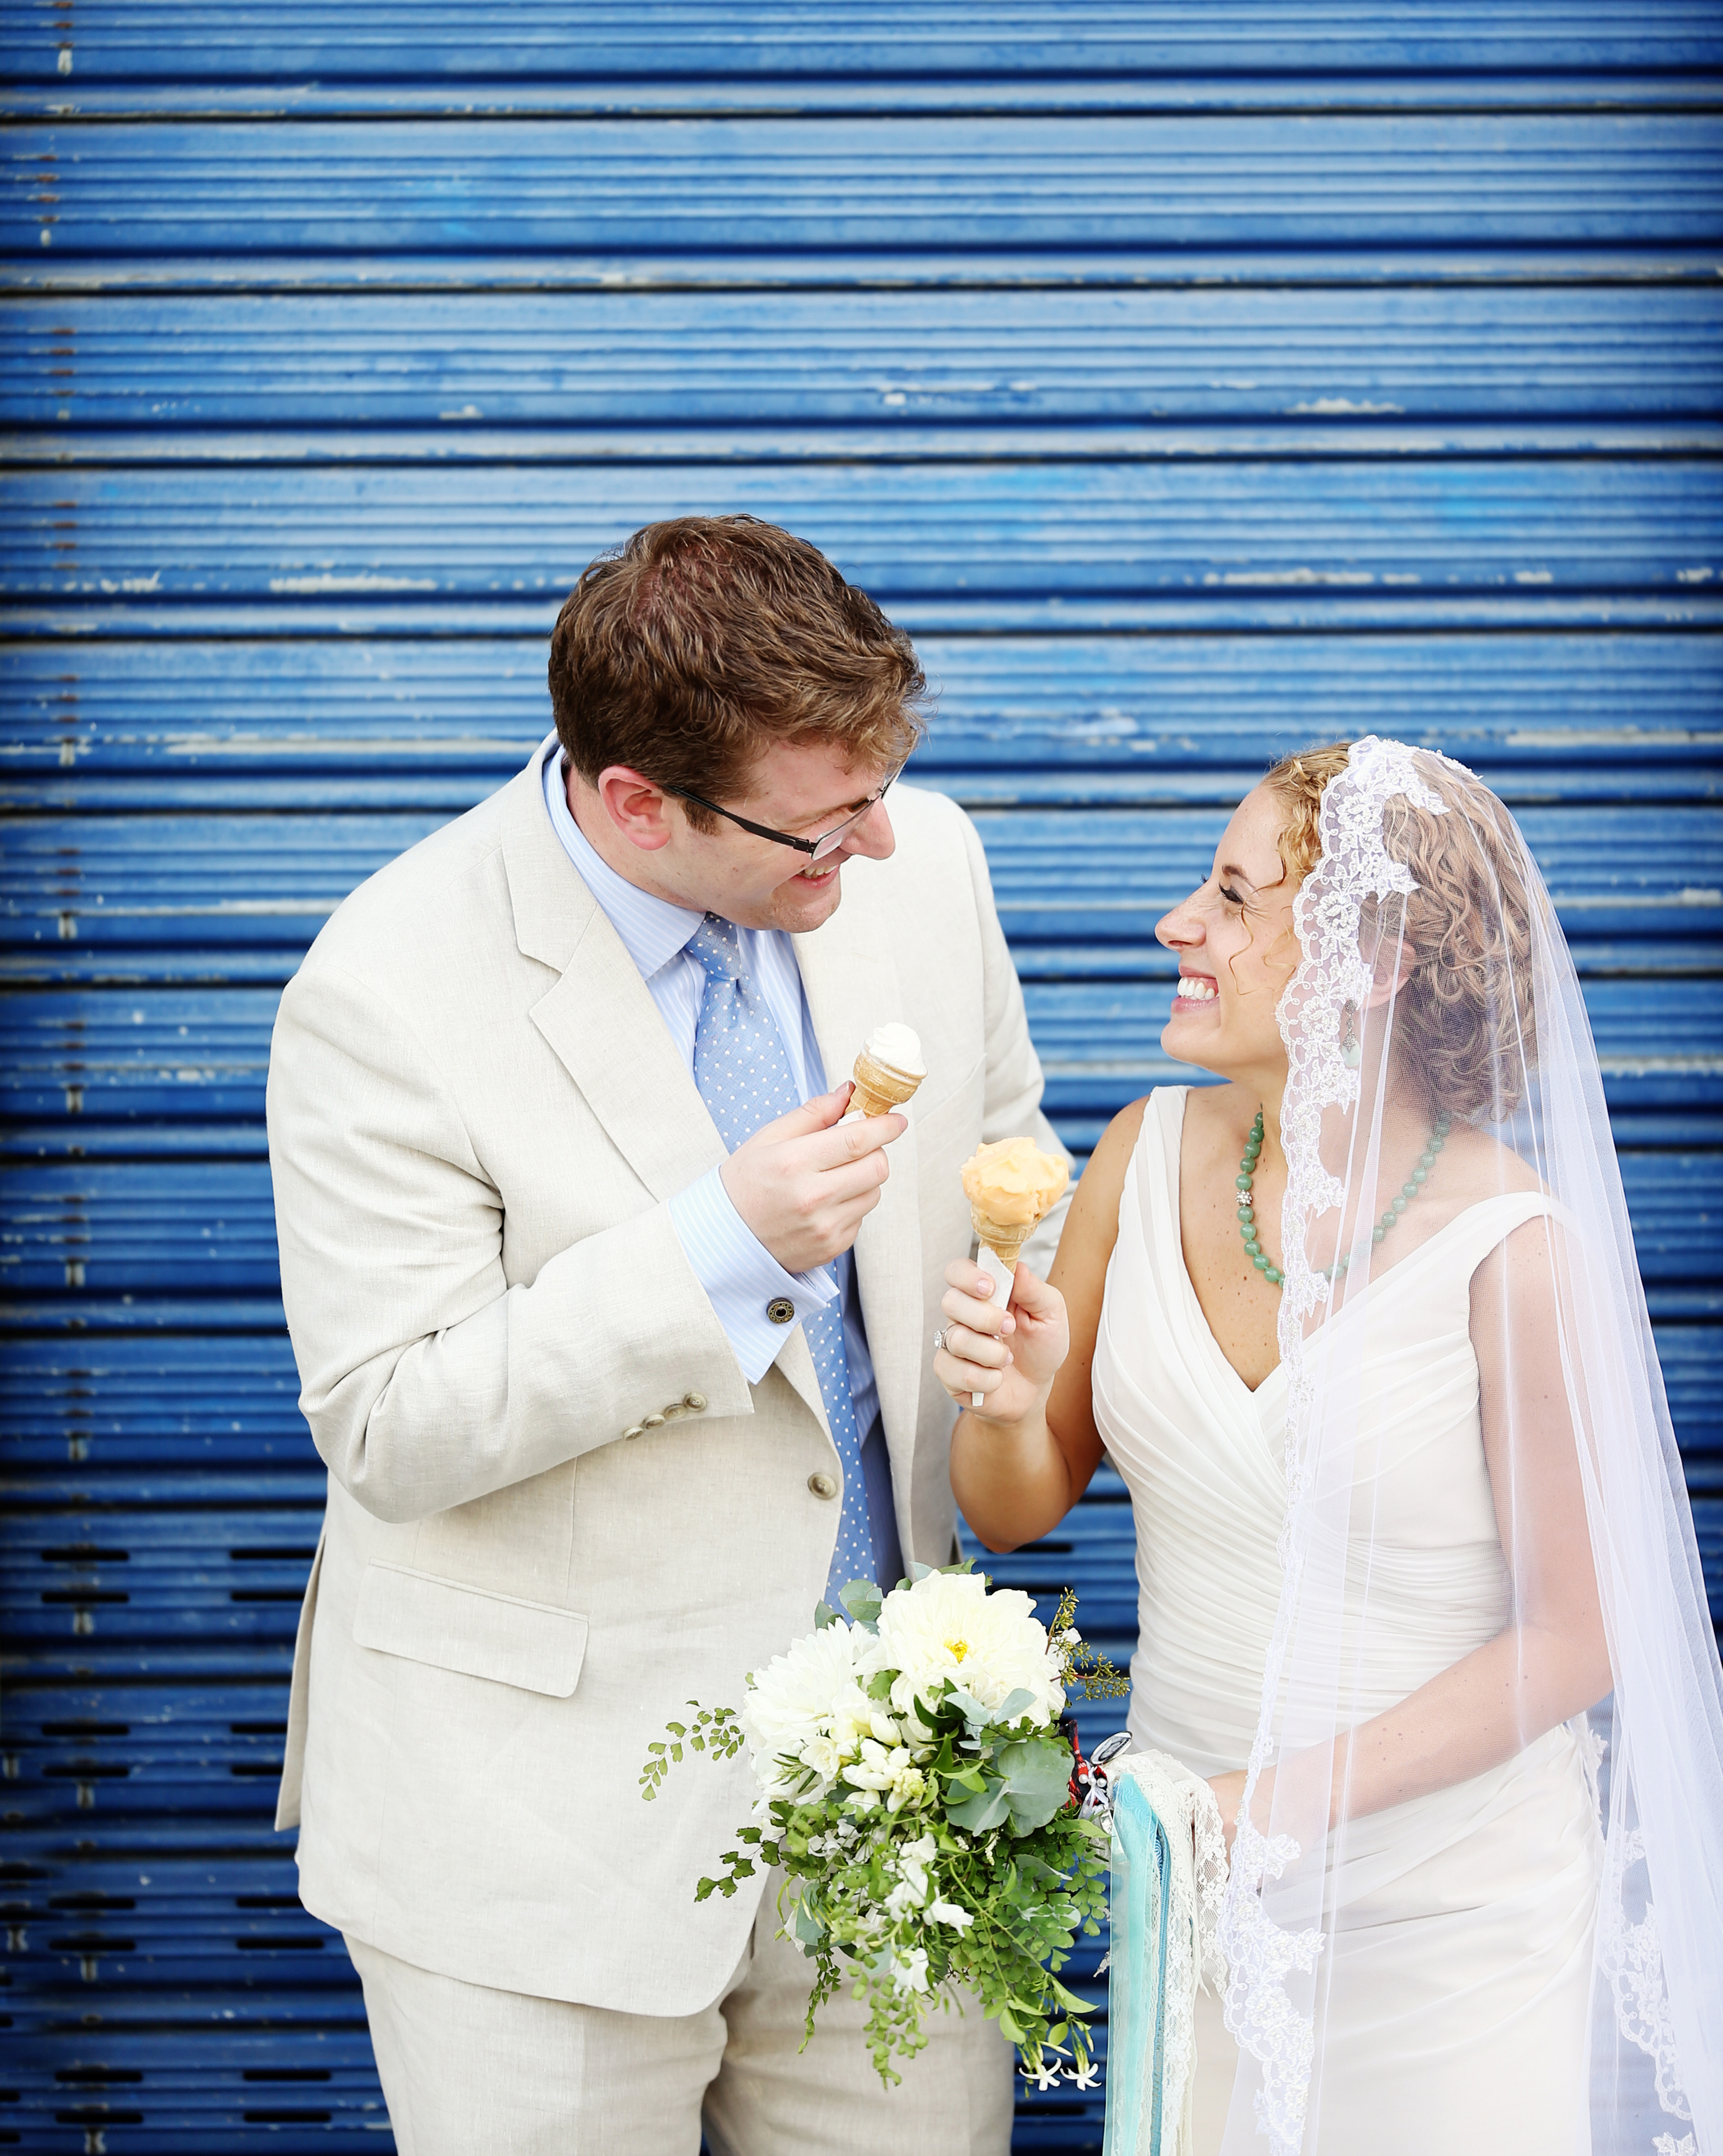 lindsay-andy-wedding-gelato-3551-s111659-1114.jpg